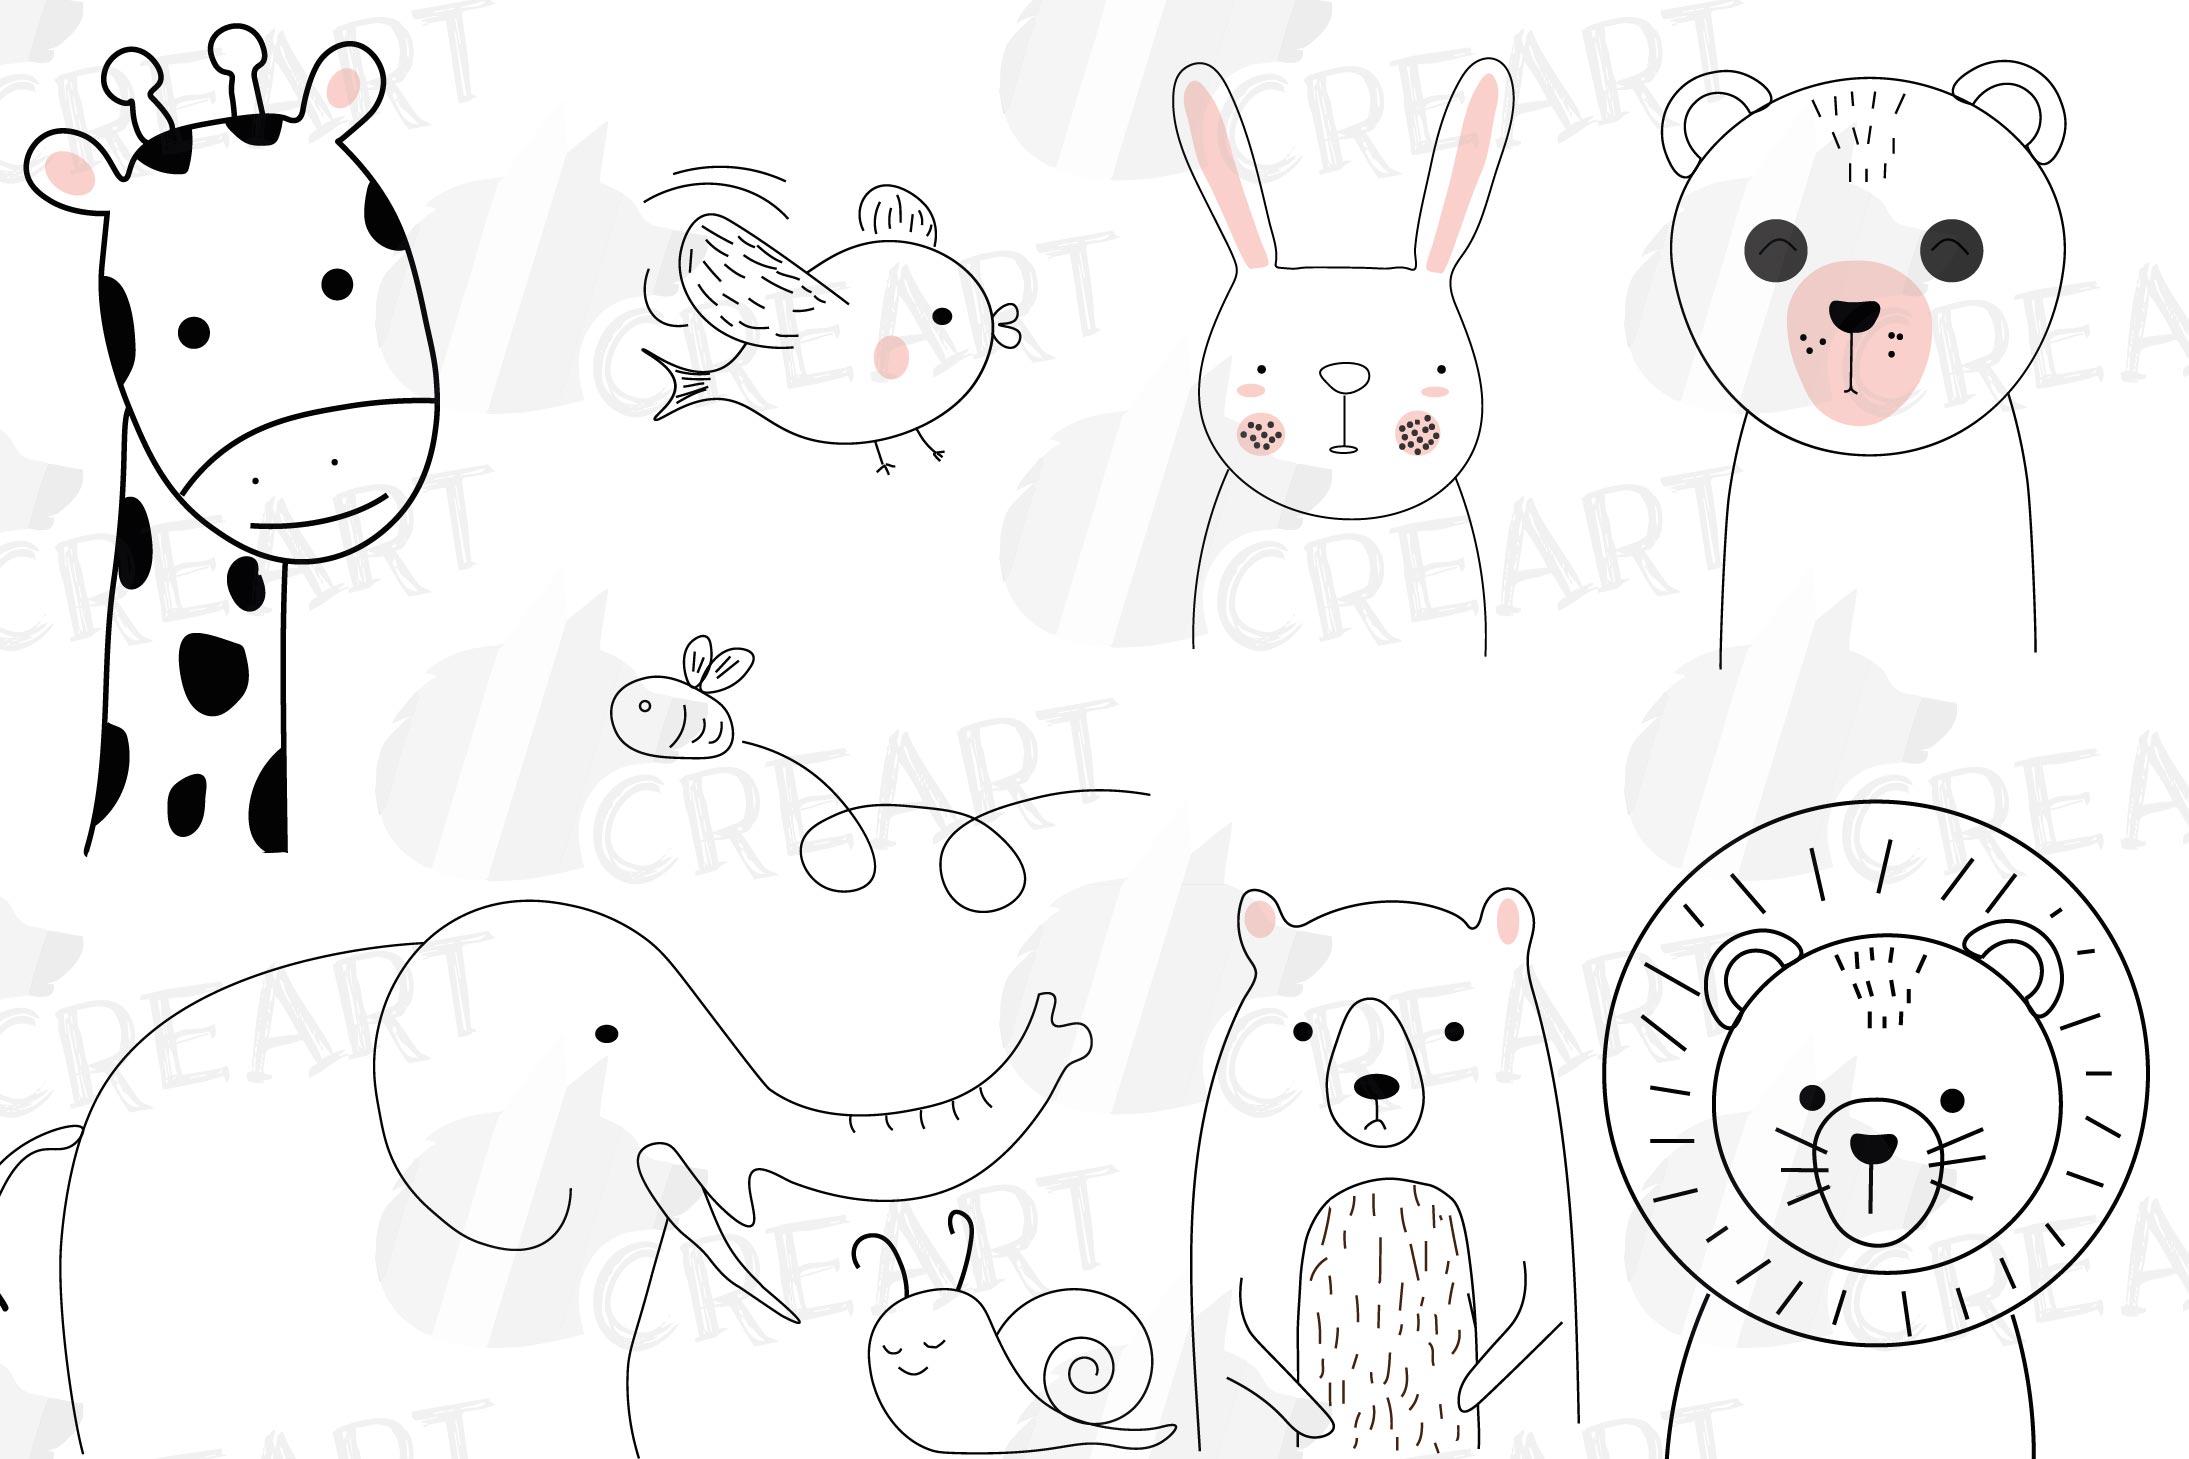 Baby animal friends line illustration, minimalist drawing